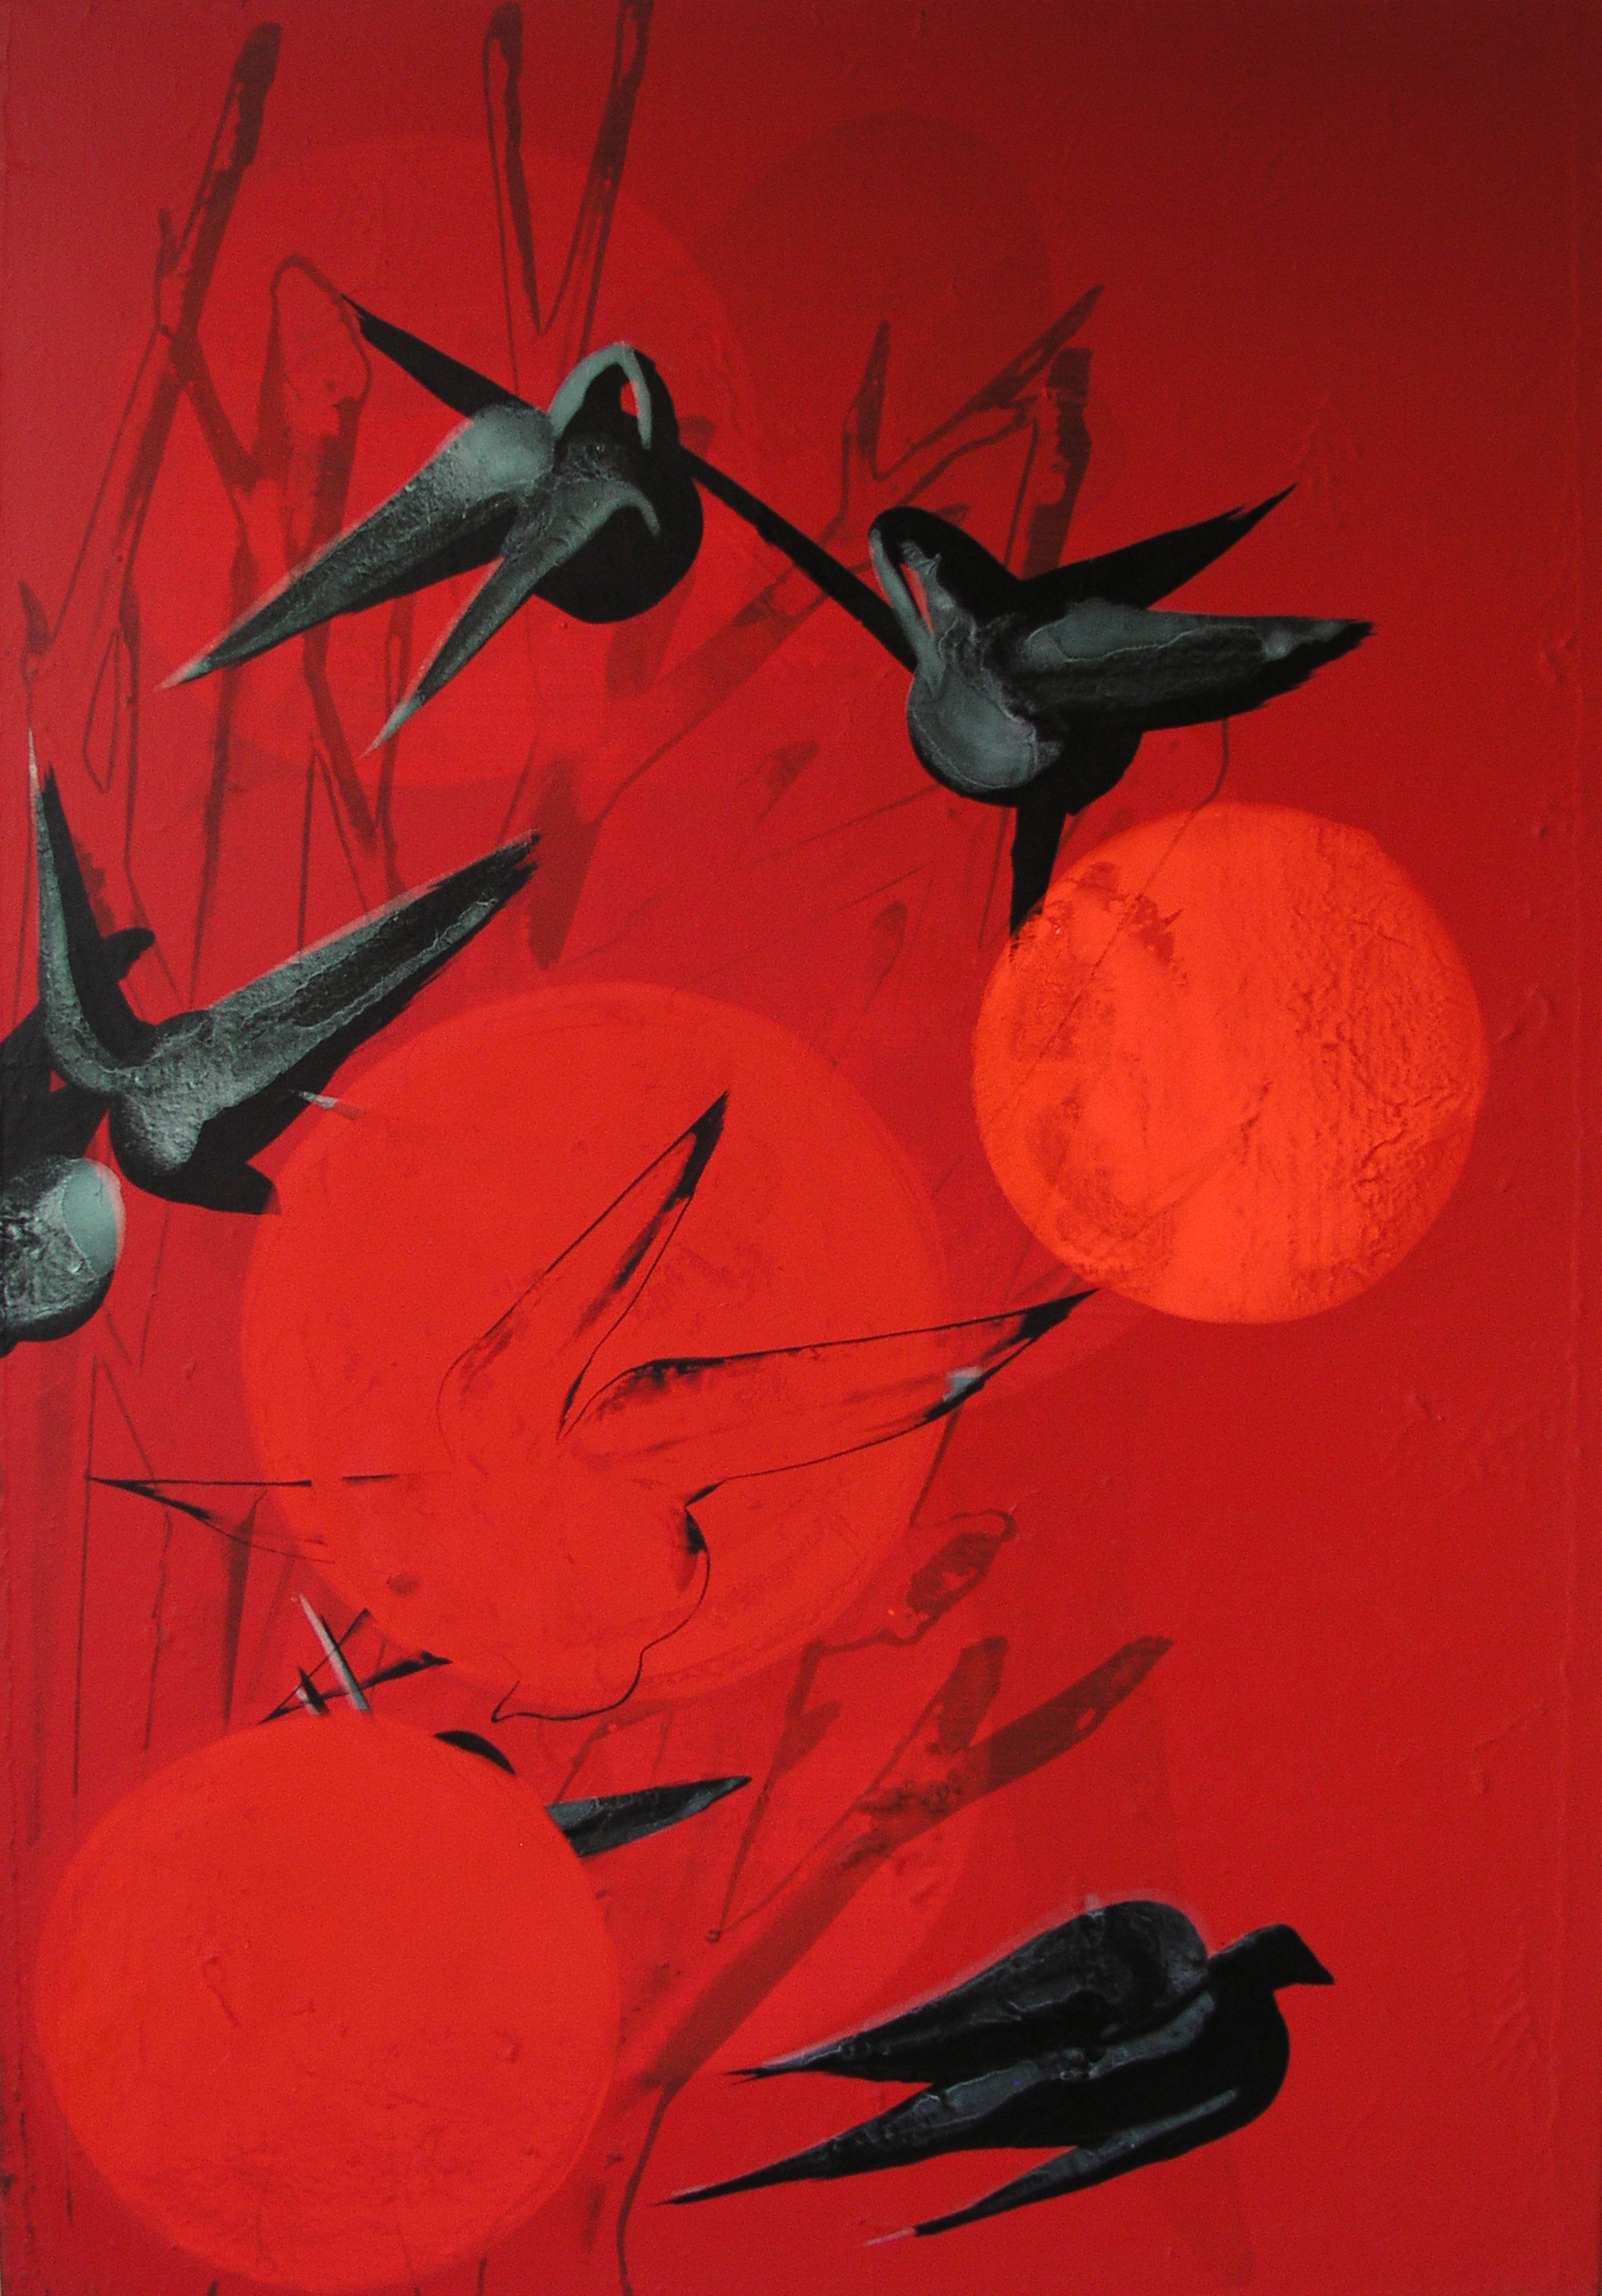 SoHyun Bae, Evening, 2007, acrylic on canvas, 100 x 70 cm